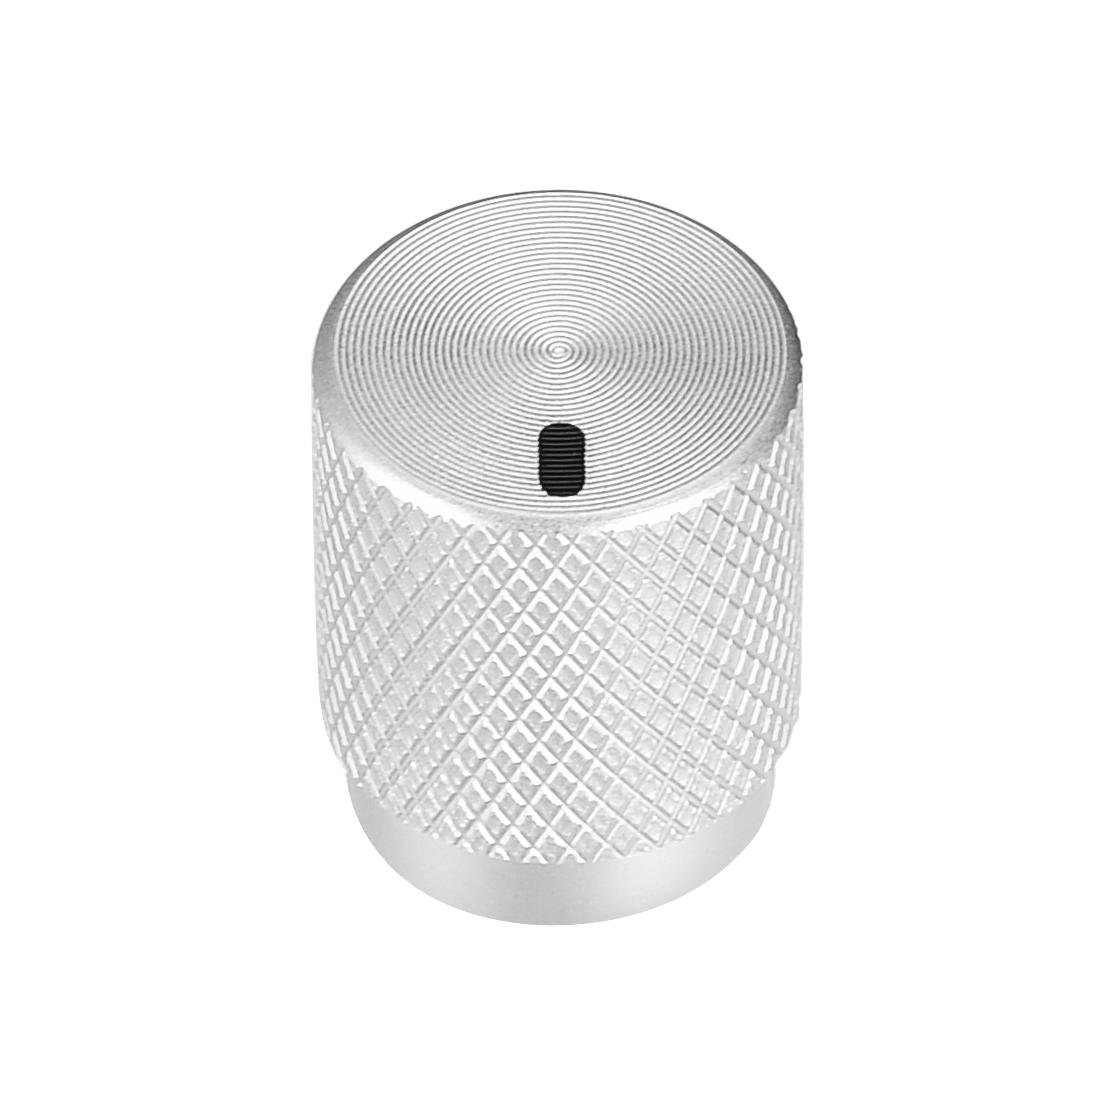 Stereo Knob, 12.5*6*16 mm Aluminium Alloy, Volume Control Knobs, Sliver